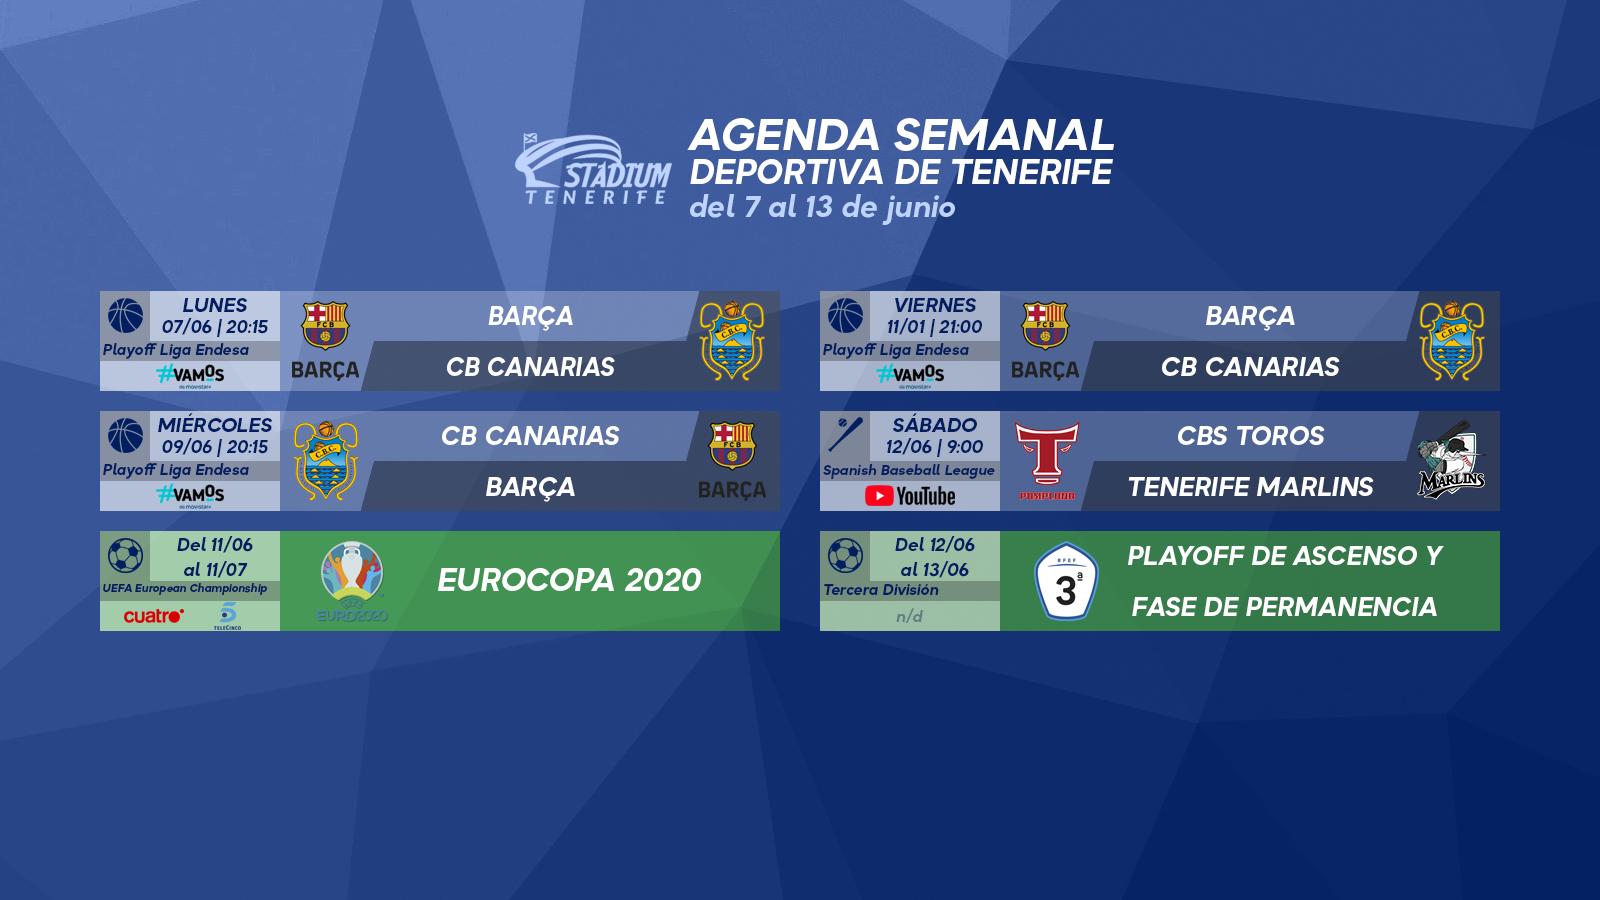 Agenda Semanal Deportiva de Tenerife (7 al 13 de junio)